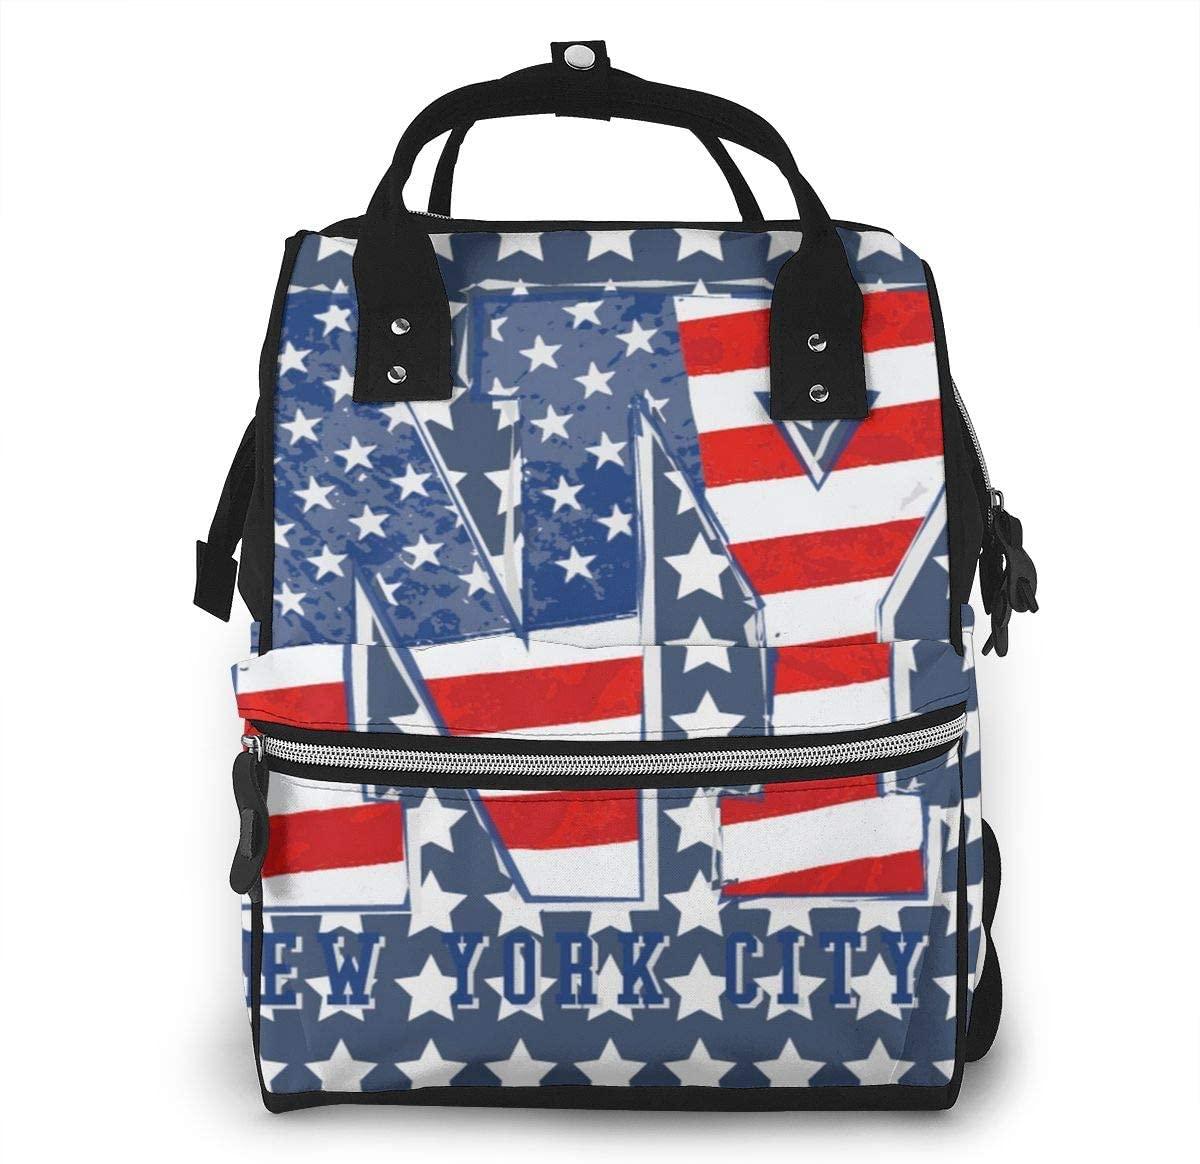 Diaper Bag Backpack Multi-Function Maternity Nappy Bags for Mom,Baby Bag,Stroller Straps-USA Patriotic American Flag New York Stars Stripes